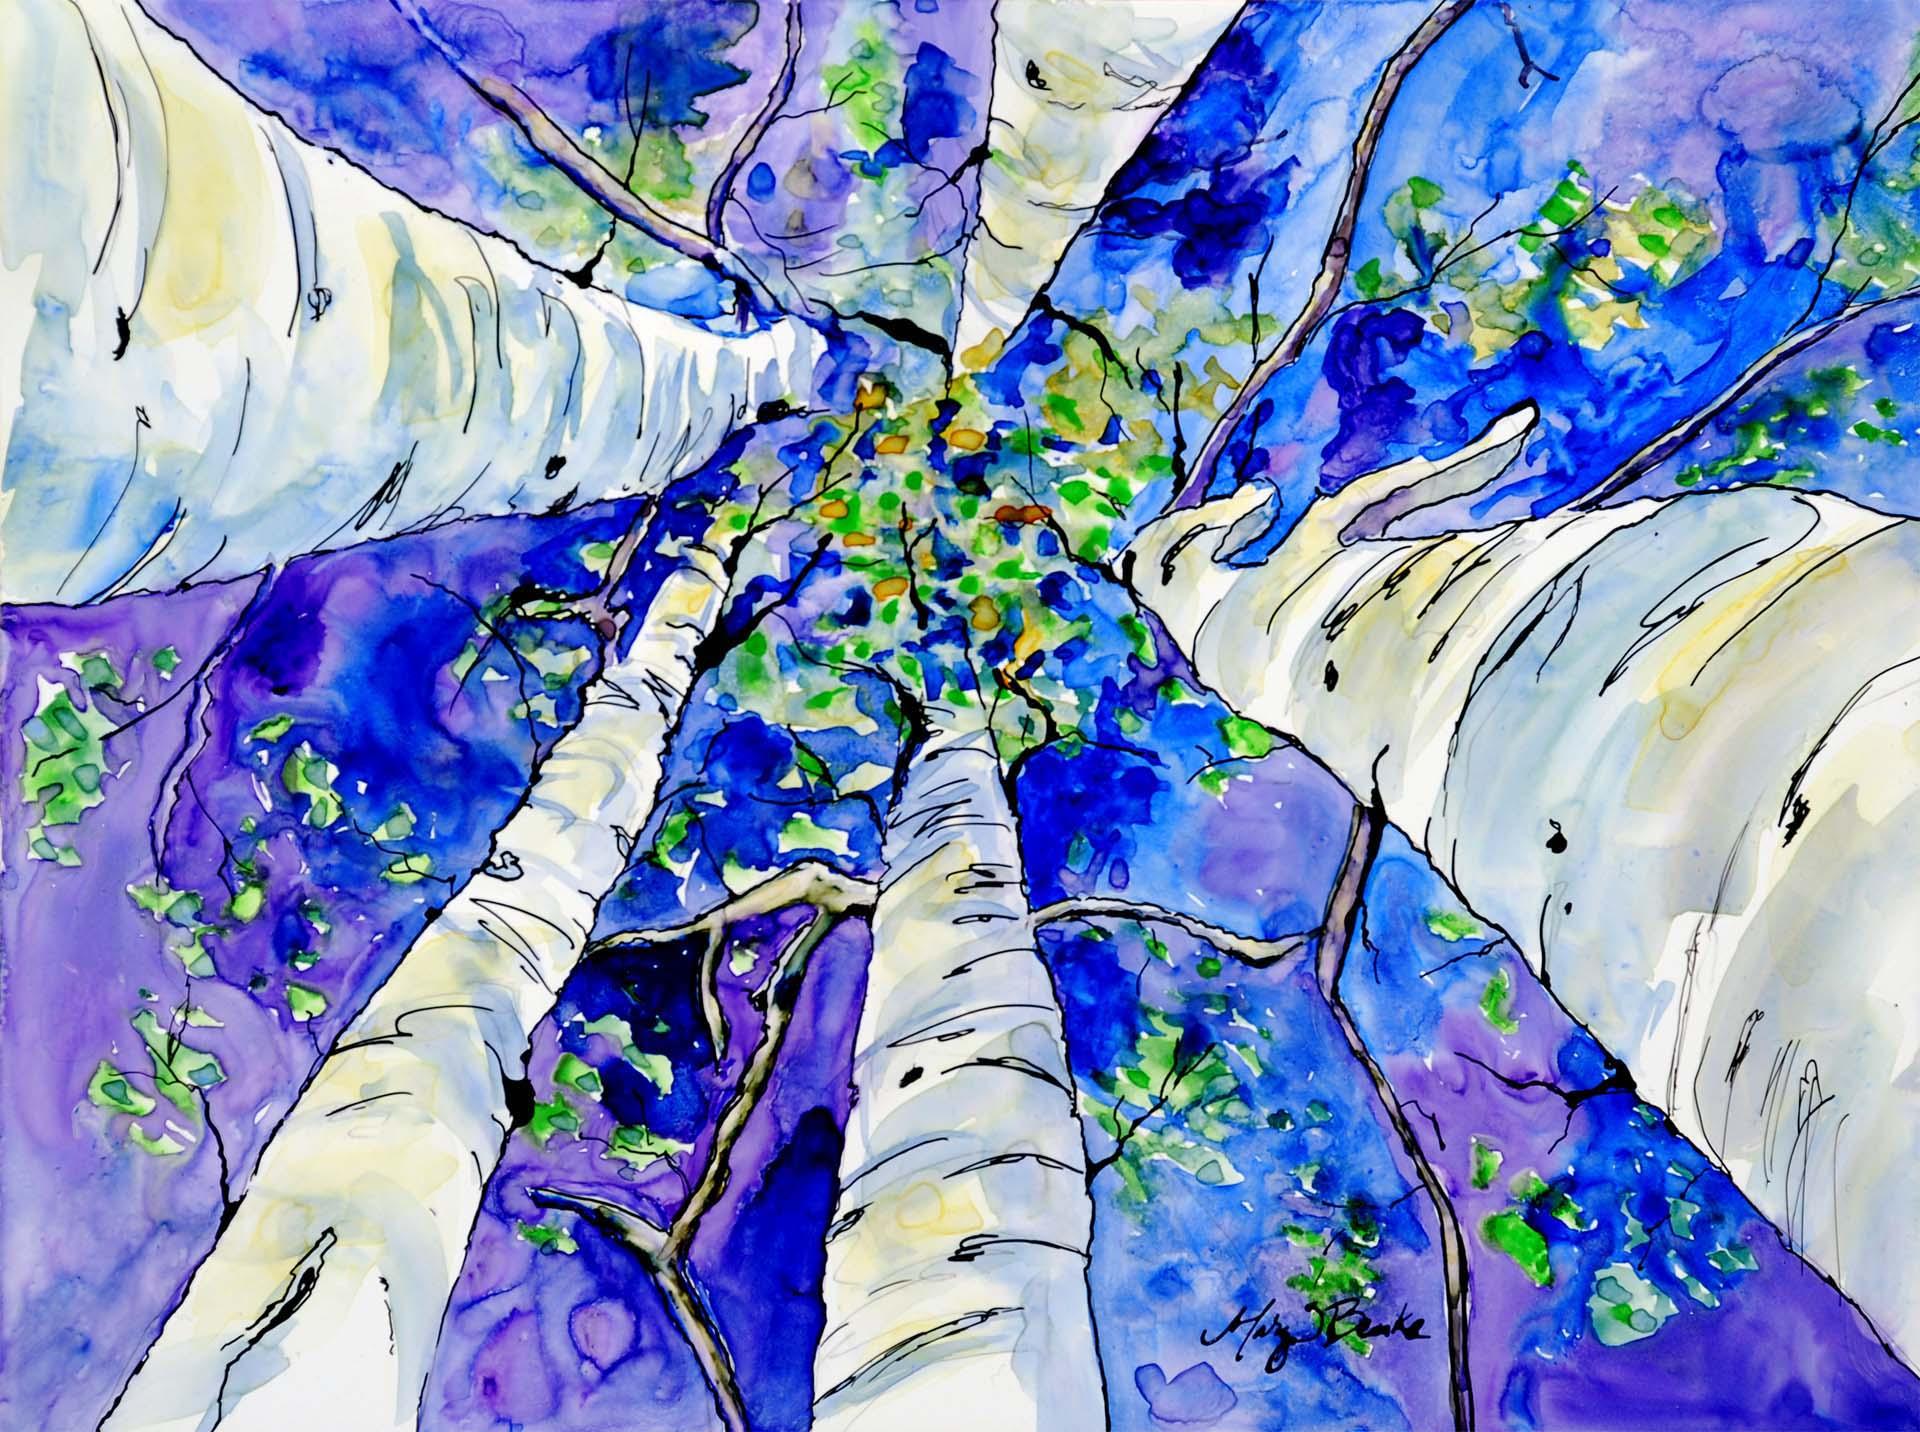 Skyward | Watercolor & Ink on Yupo | 9 x 12 | $350